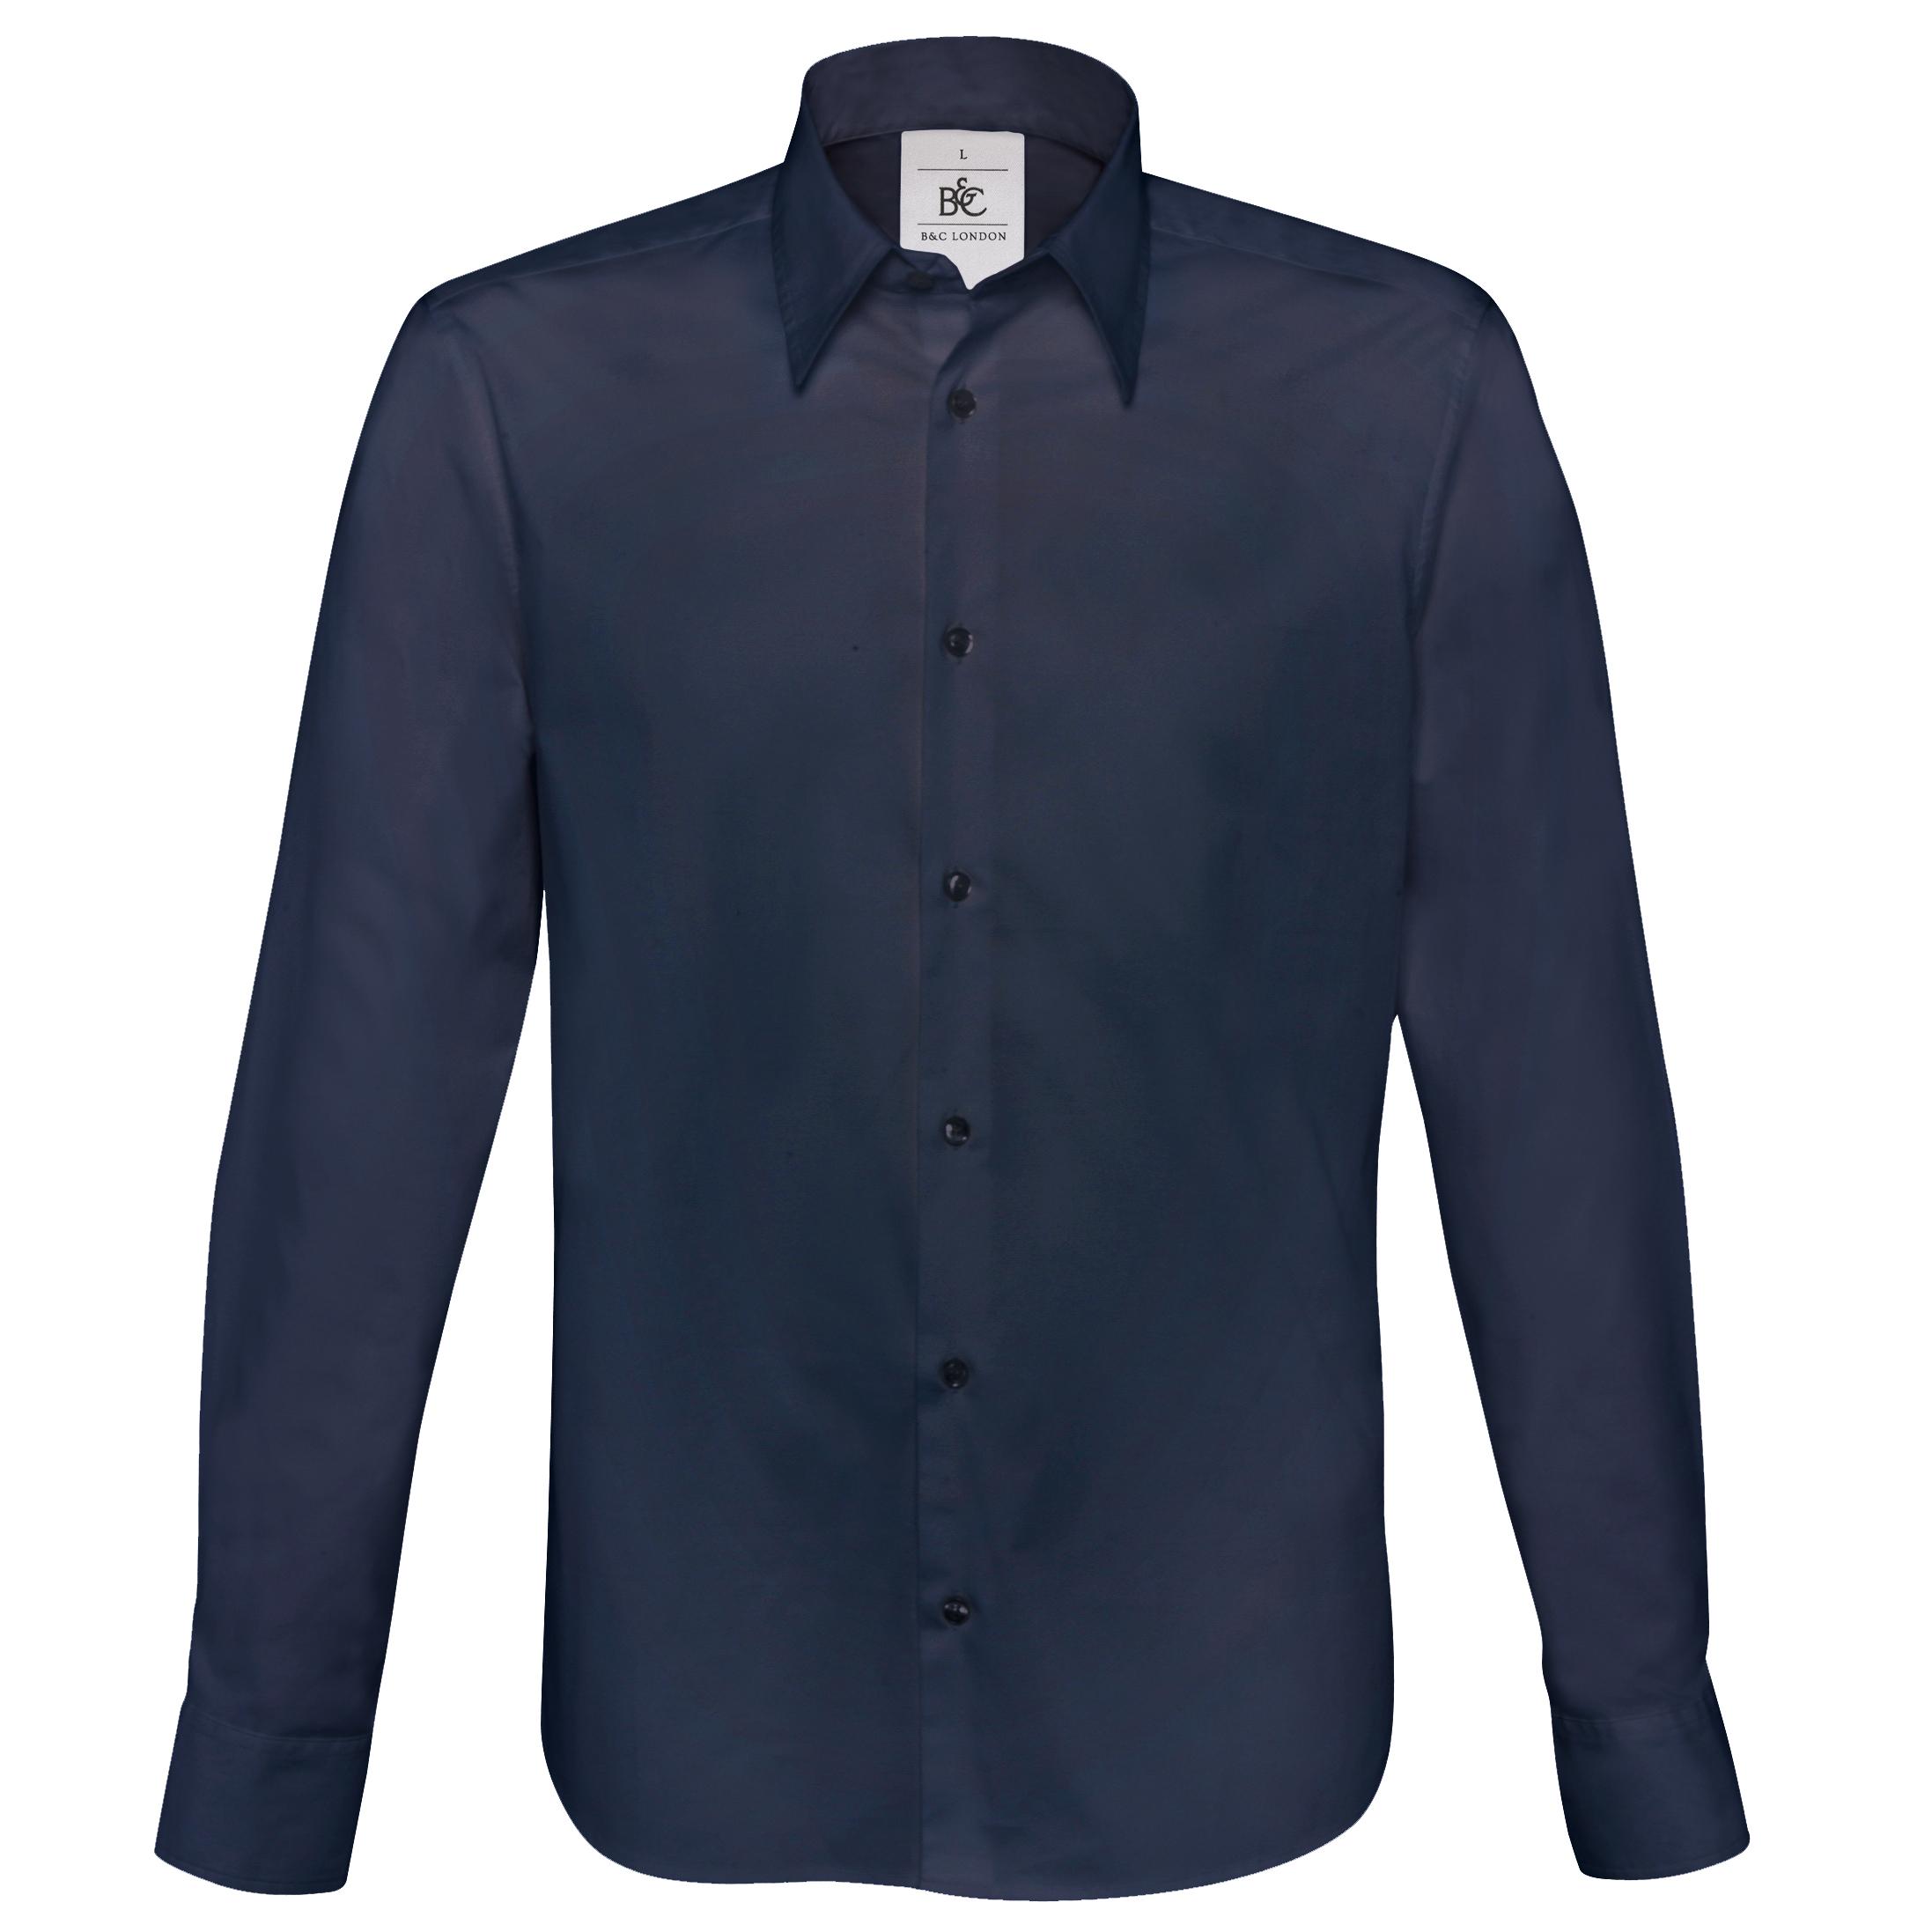 B&C Mens London Long Sleeve Poplin Shirt (S) (Navy)